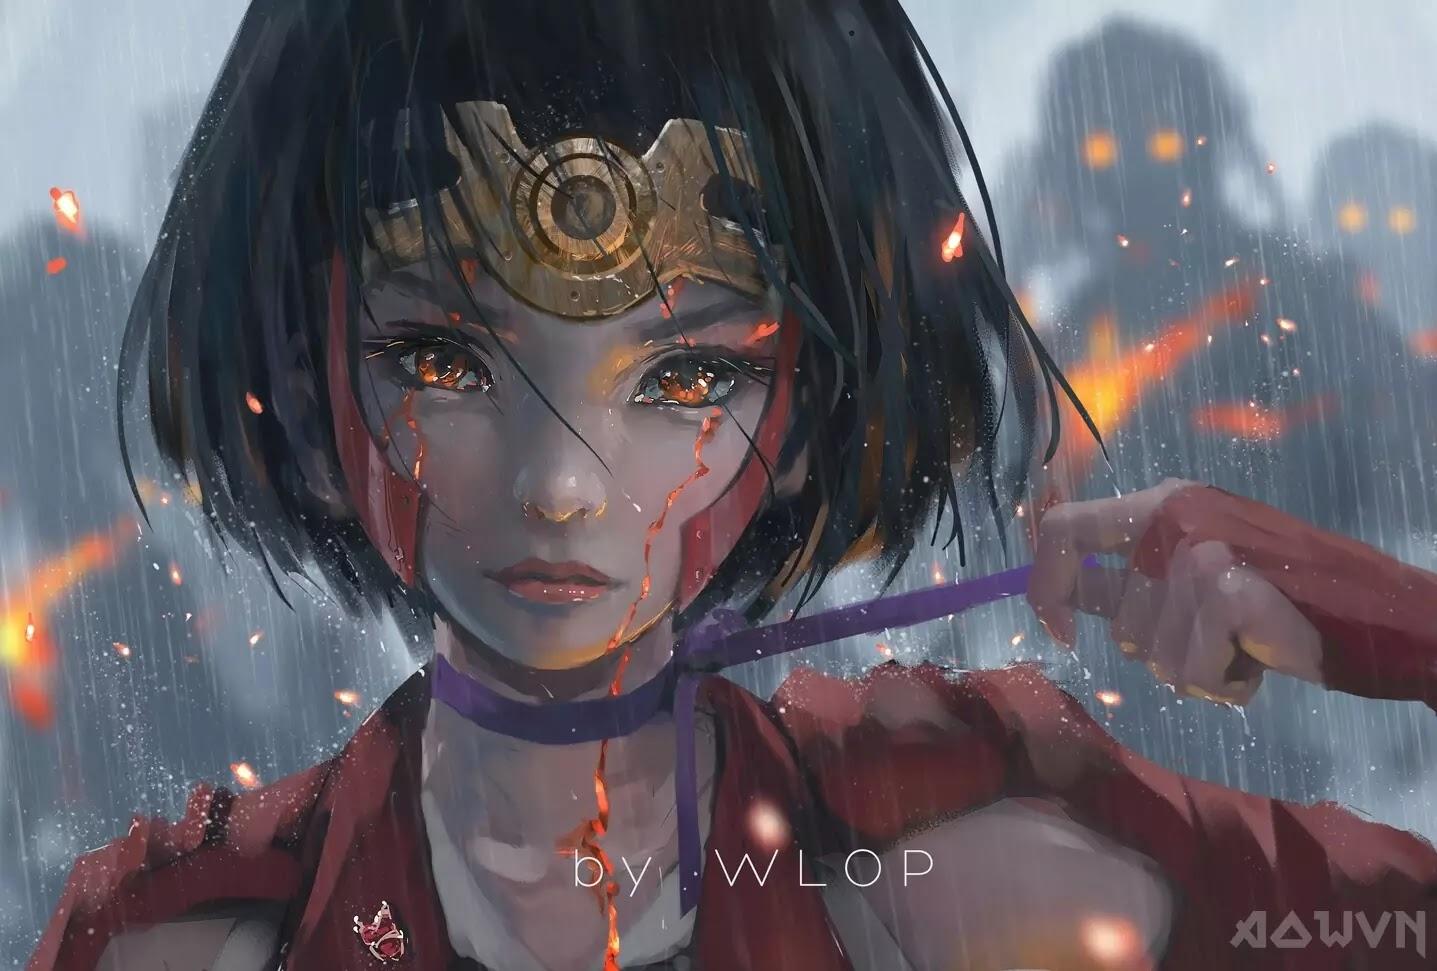 38 AowVN.org m - [ Hình Nền ] Anime Cực Đẹp by Wlop | Wallpaper Premium / Update